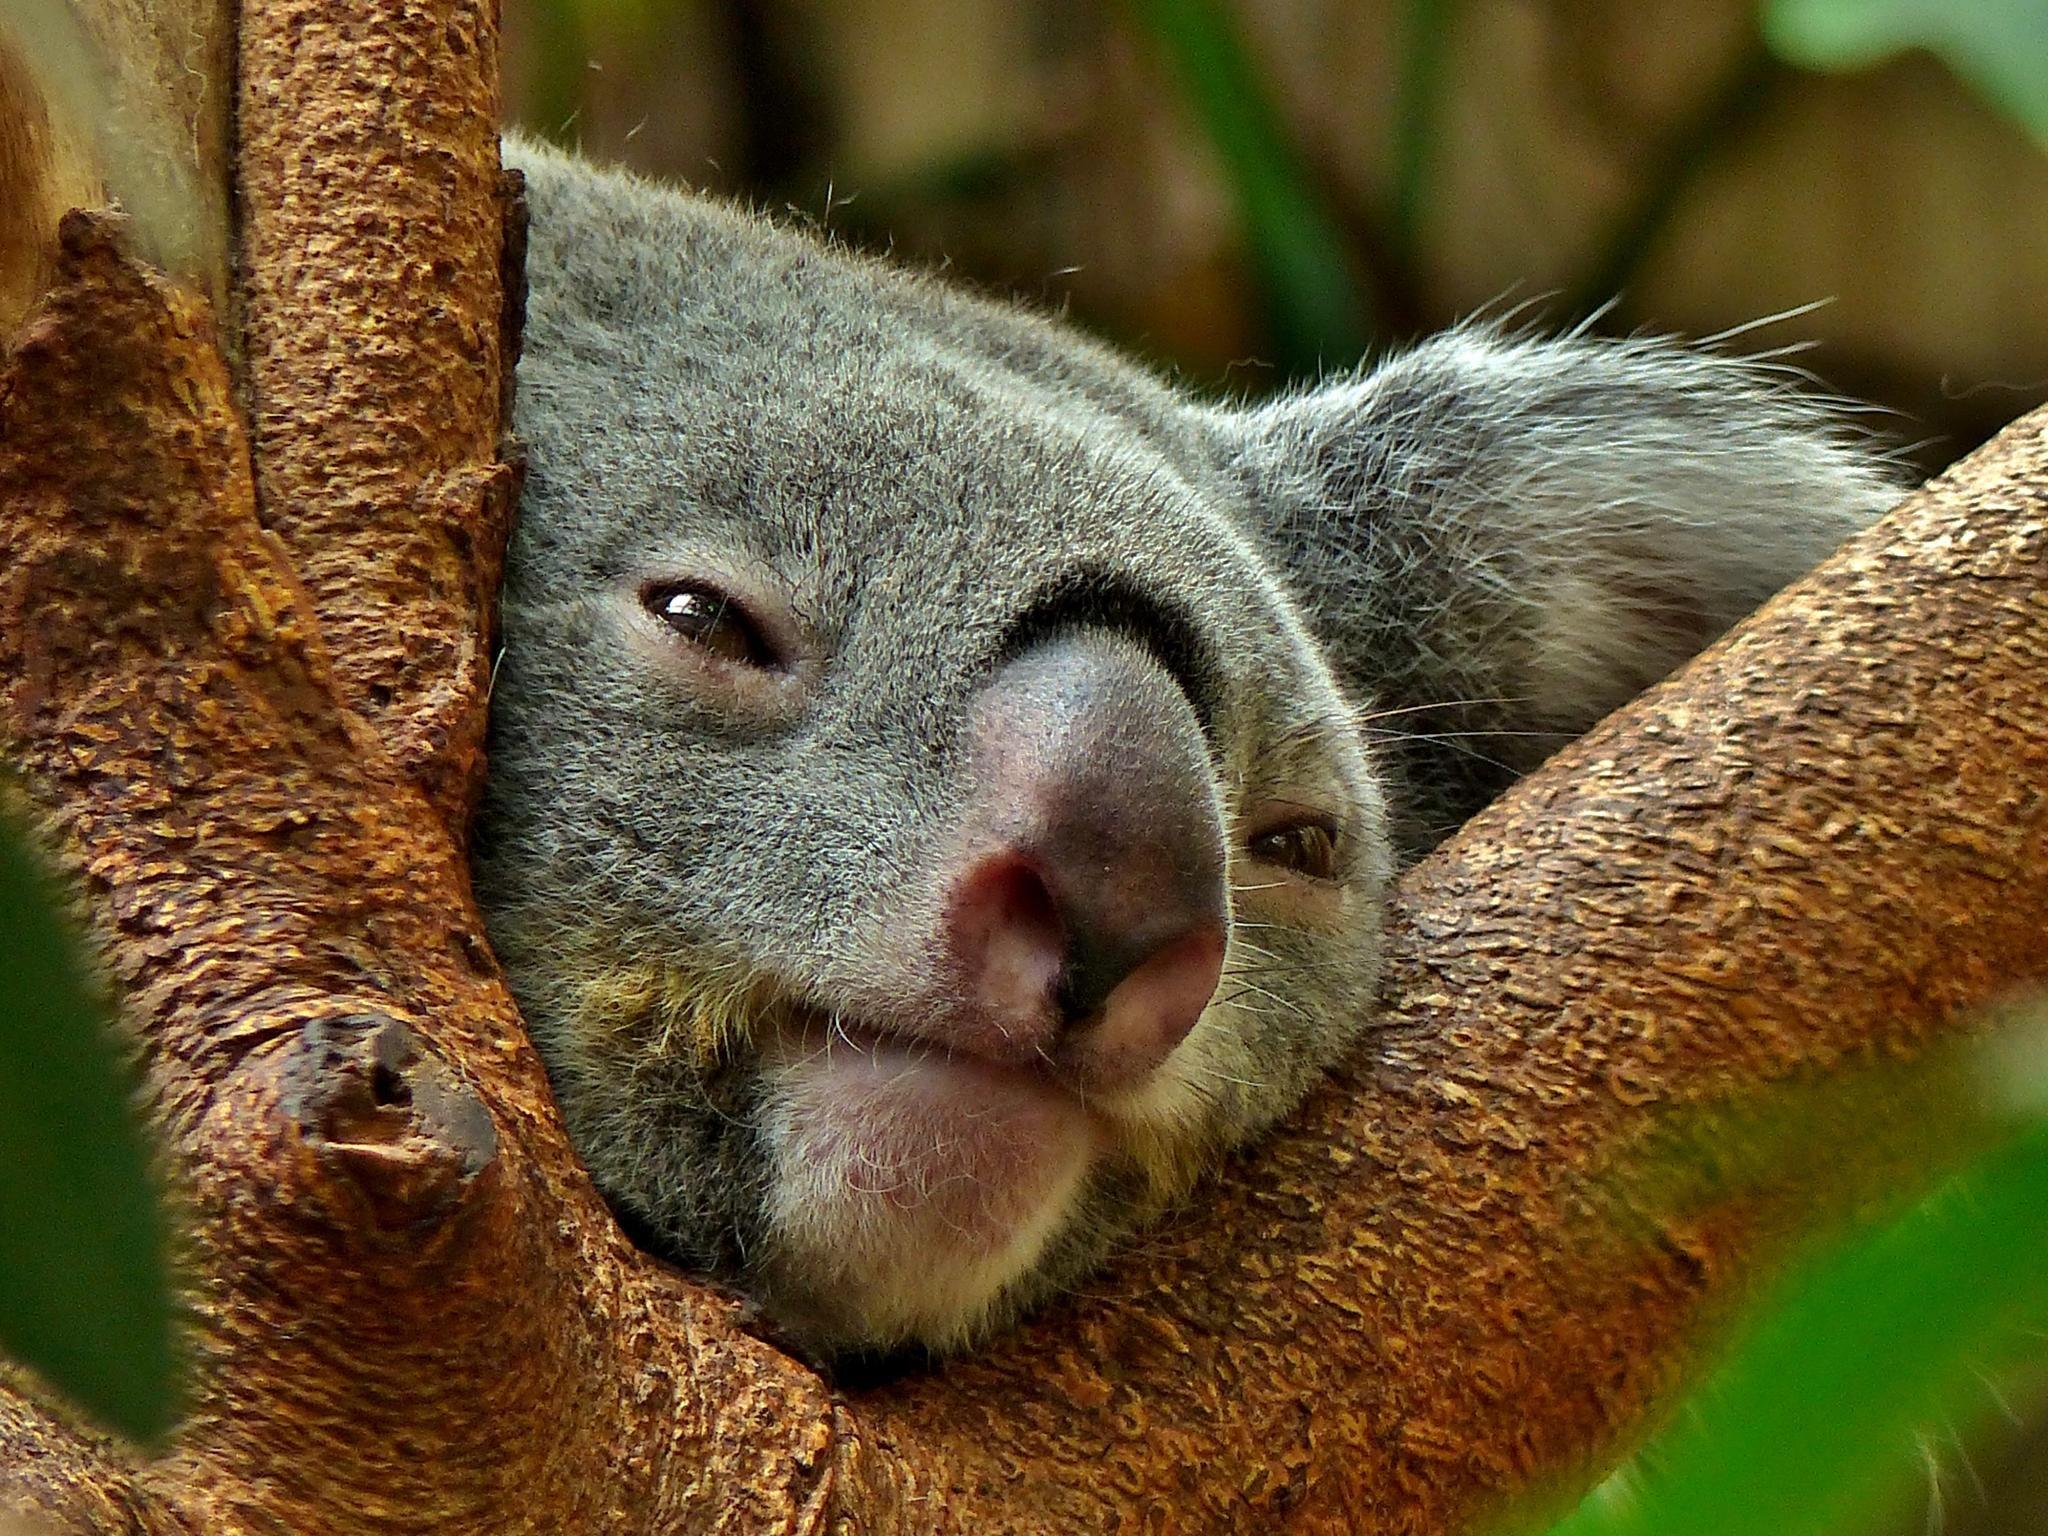 Koala Quotes Wallpapers Koala Computer Wallpapers Desktop Backgrounds 2048x1536